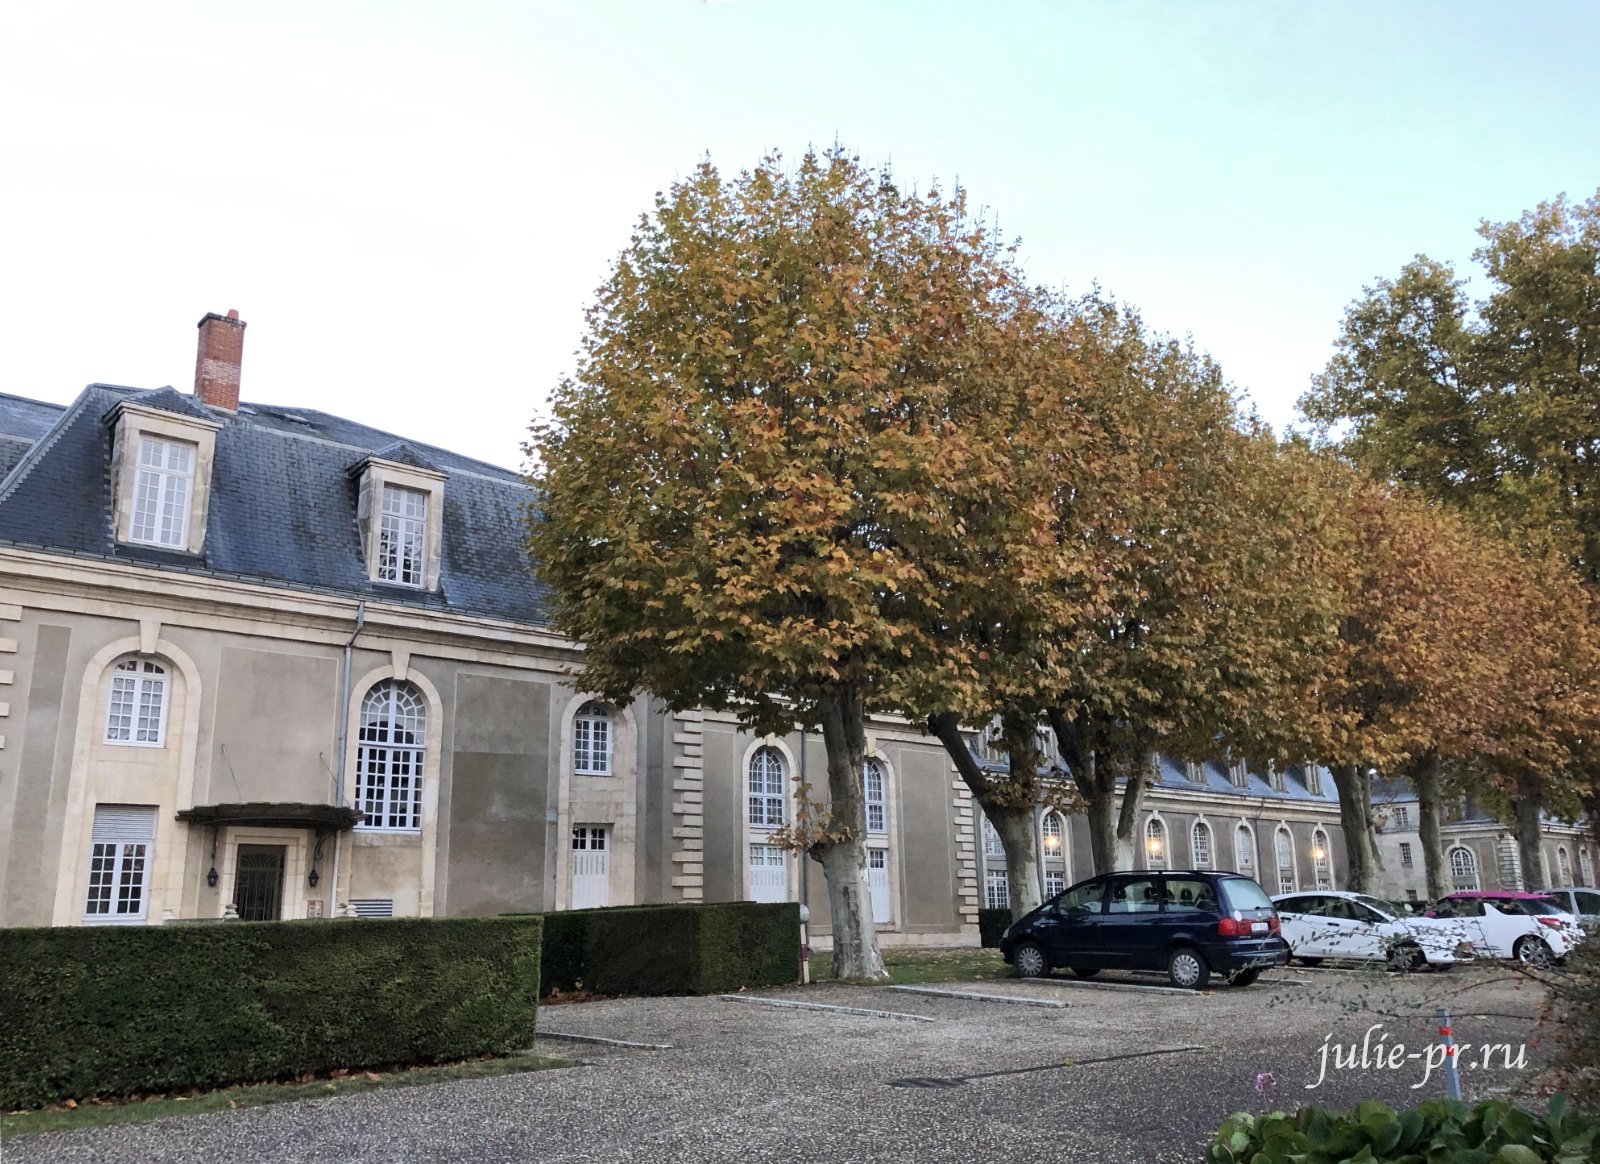 Рошфор, Франция